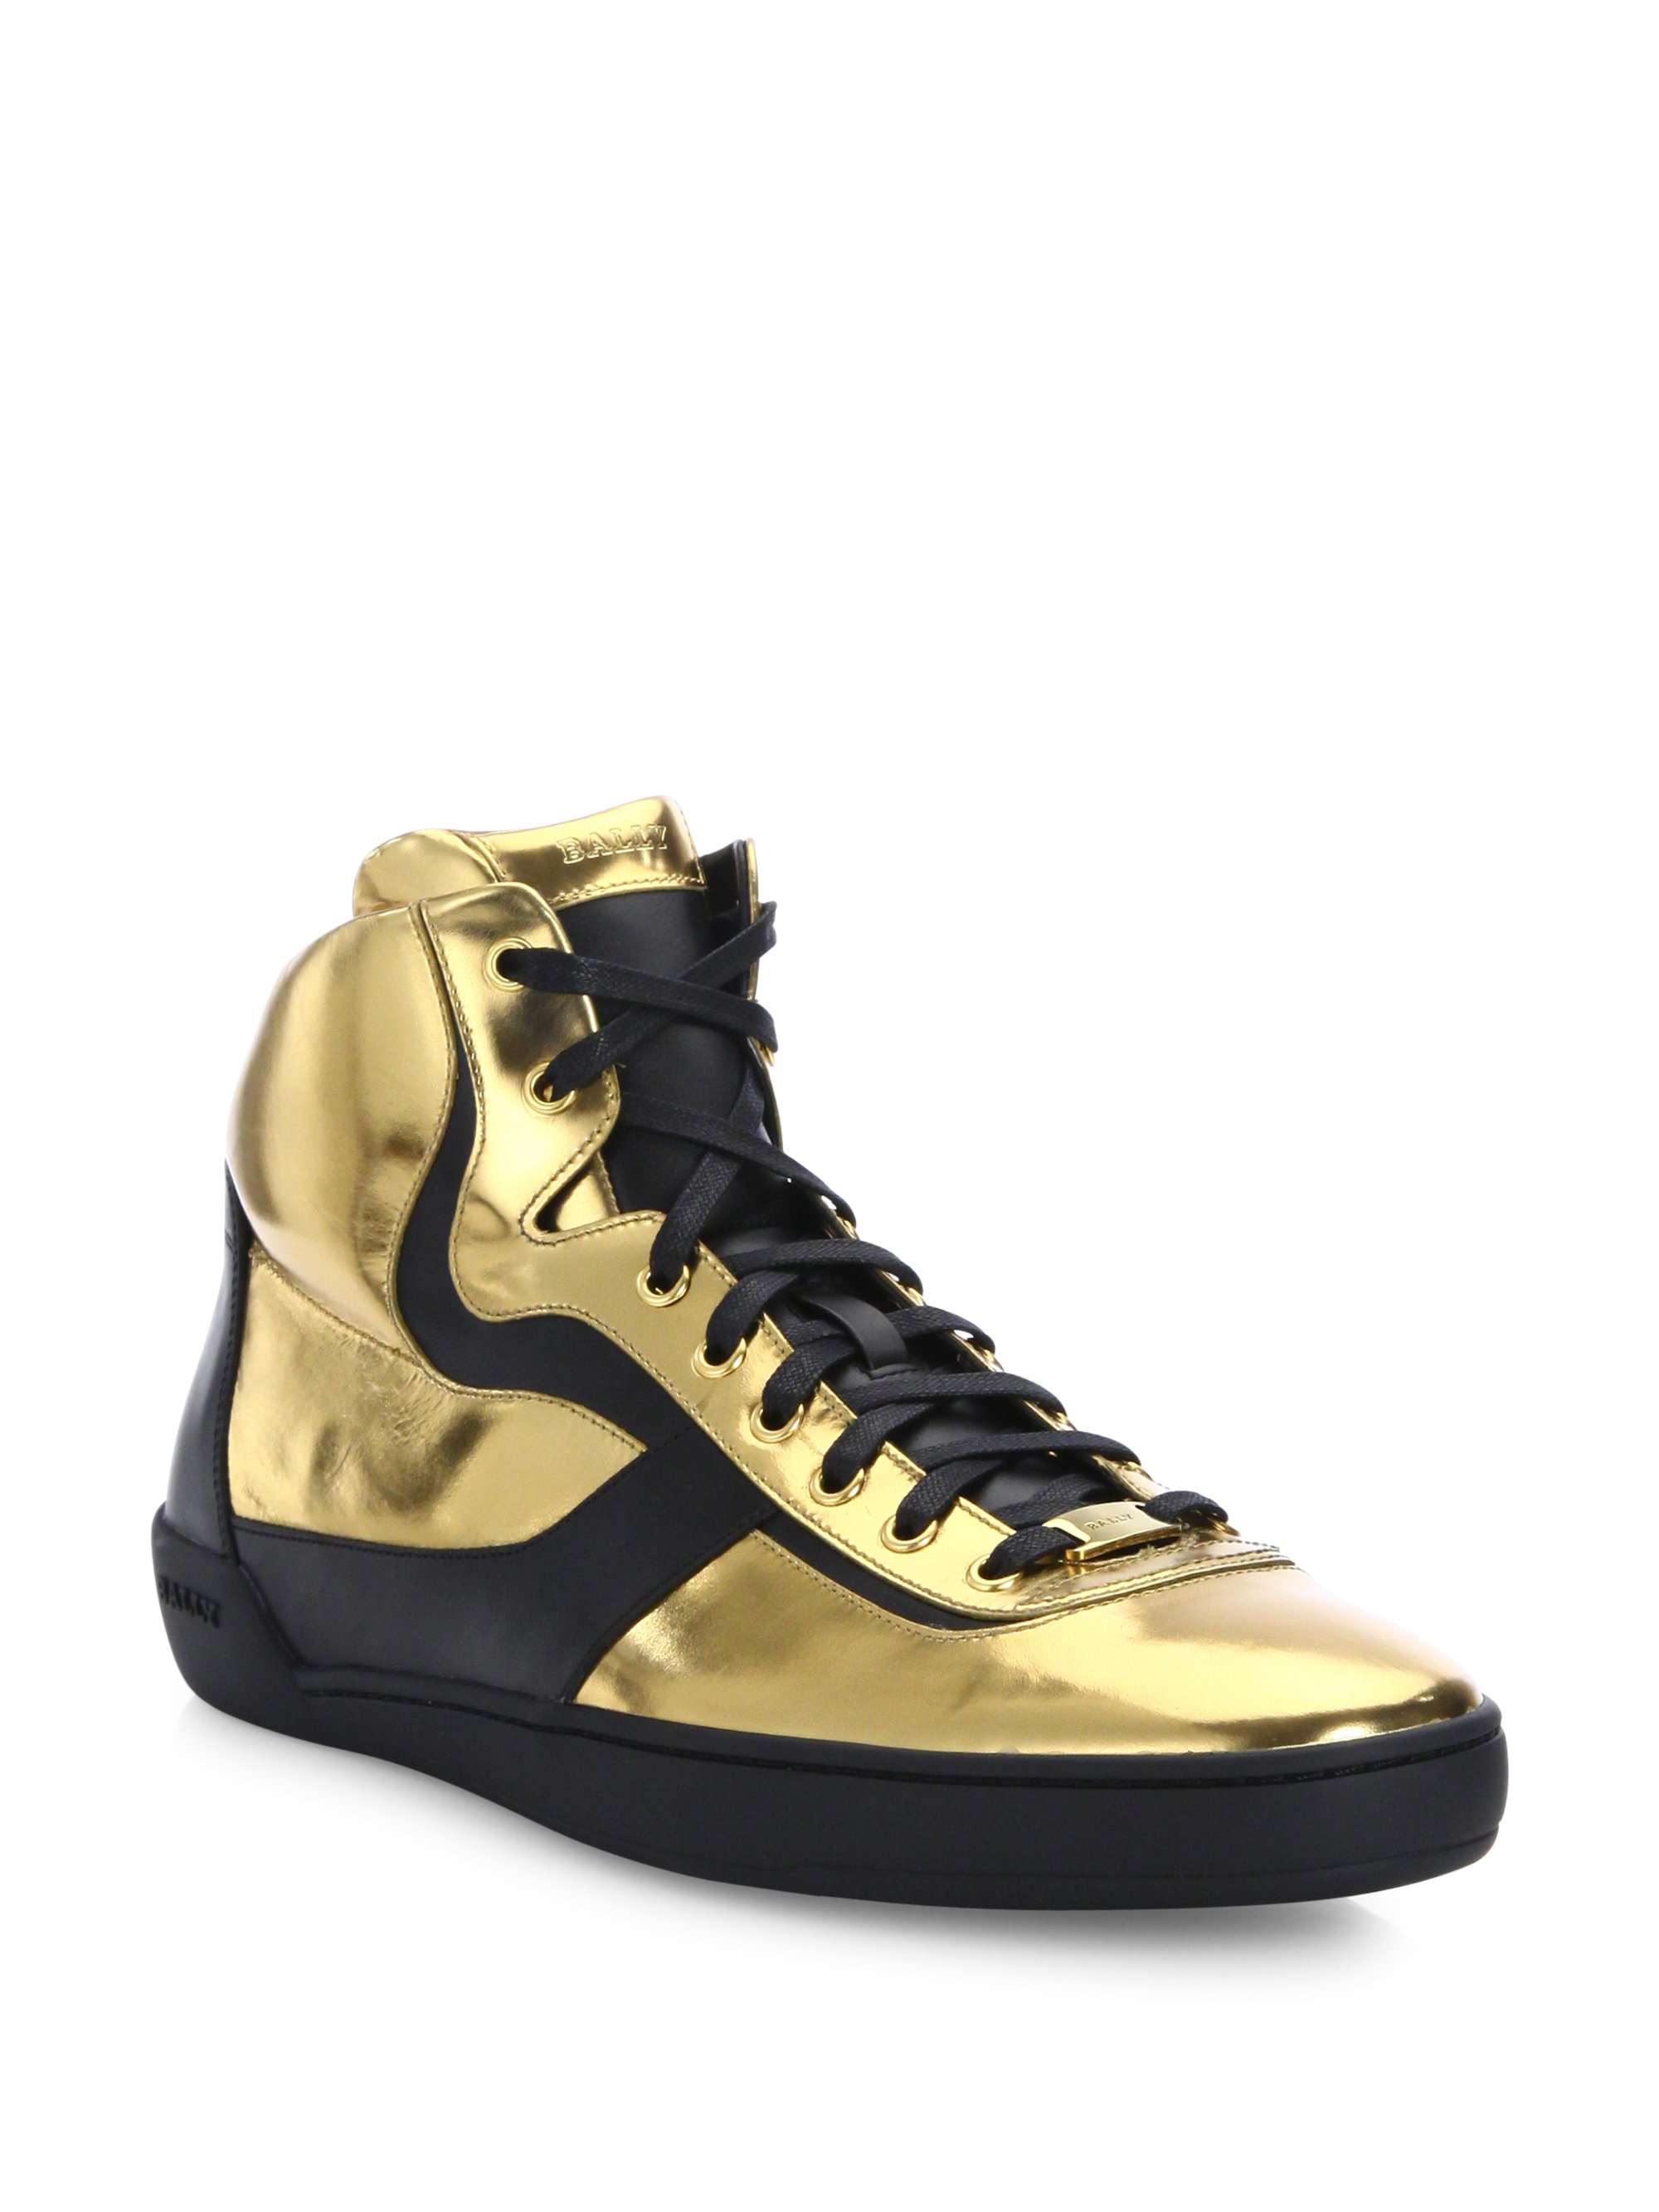 Bally Eroy Metallic Calf Leather High Top Sneakers In